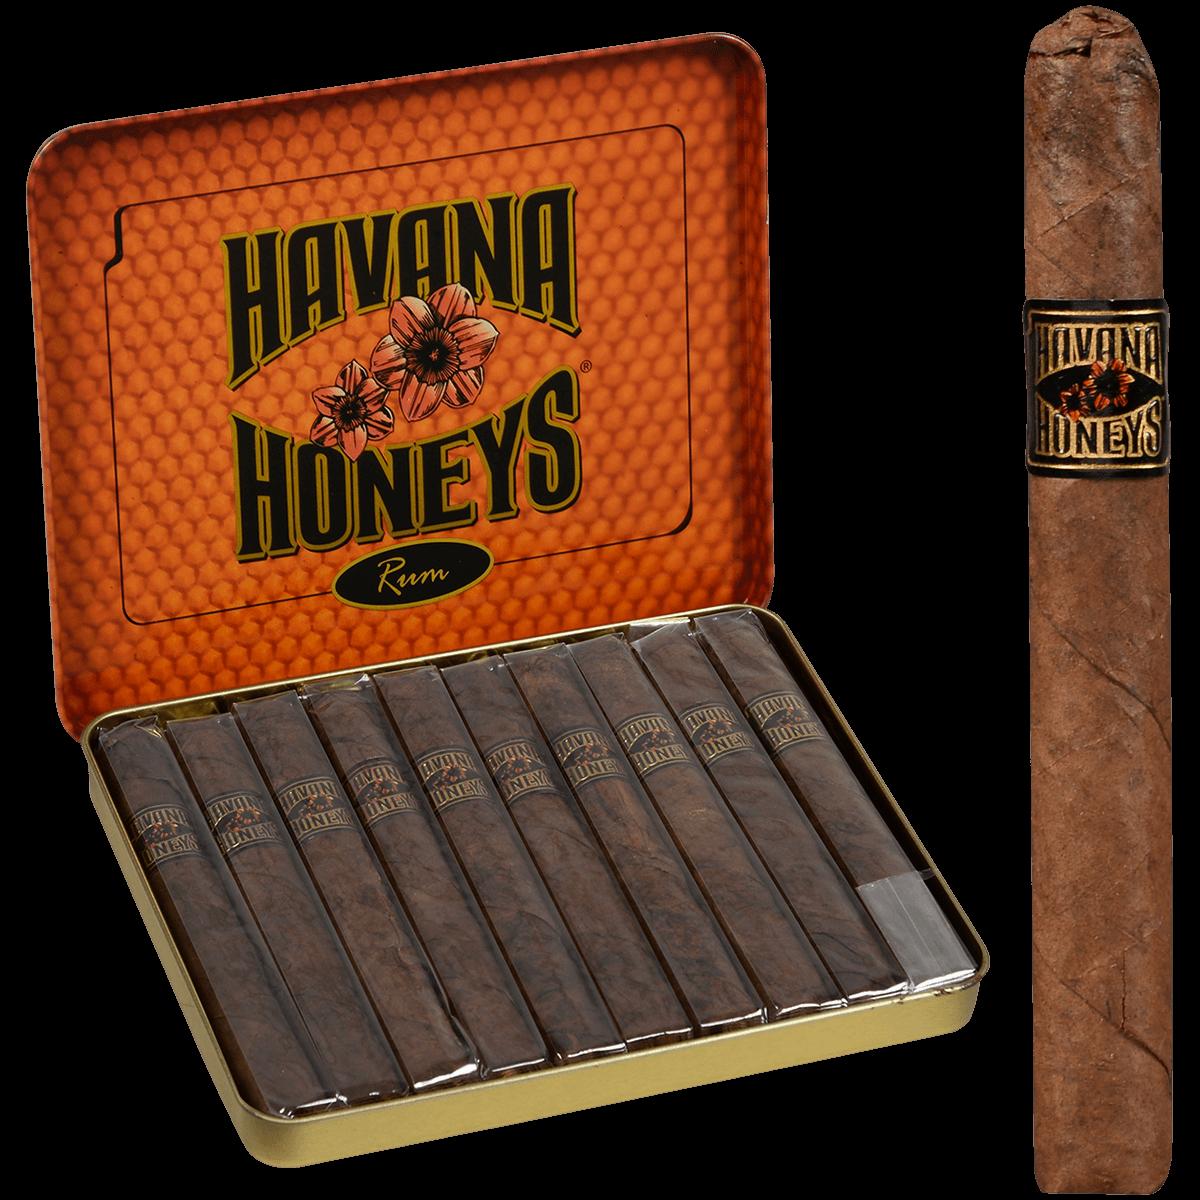 Havana Honeys Cigars Rum Tin - Boswell Pipes - Premium Cigars